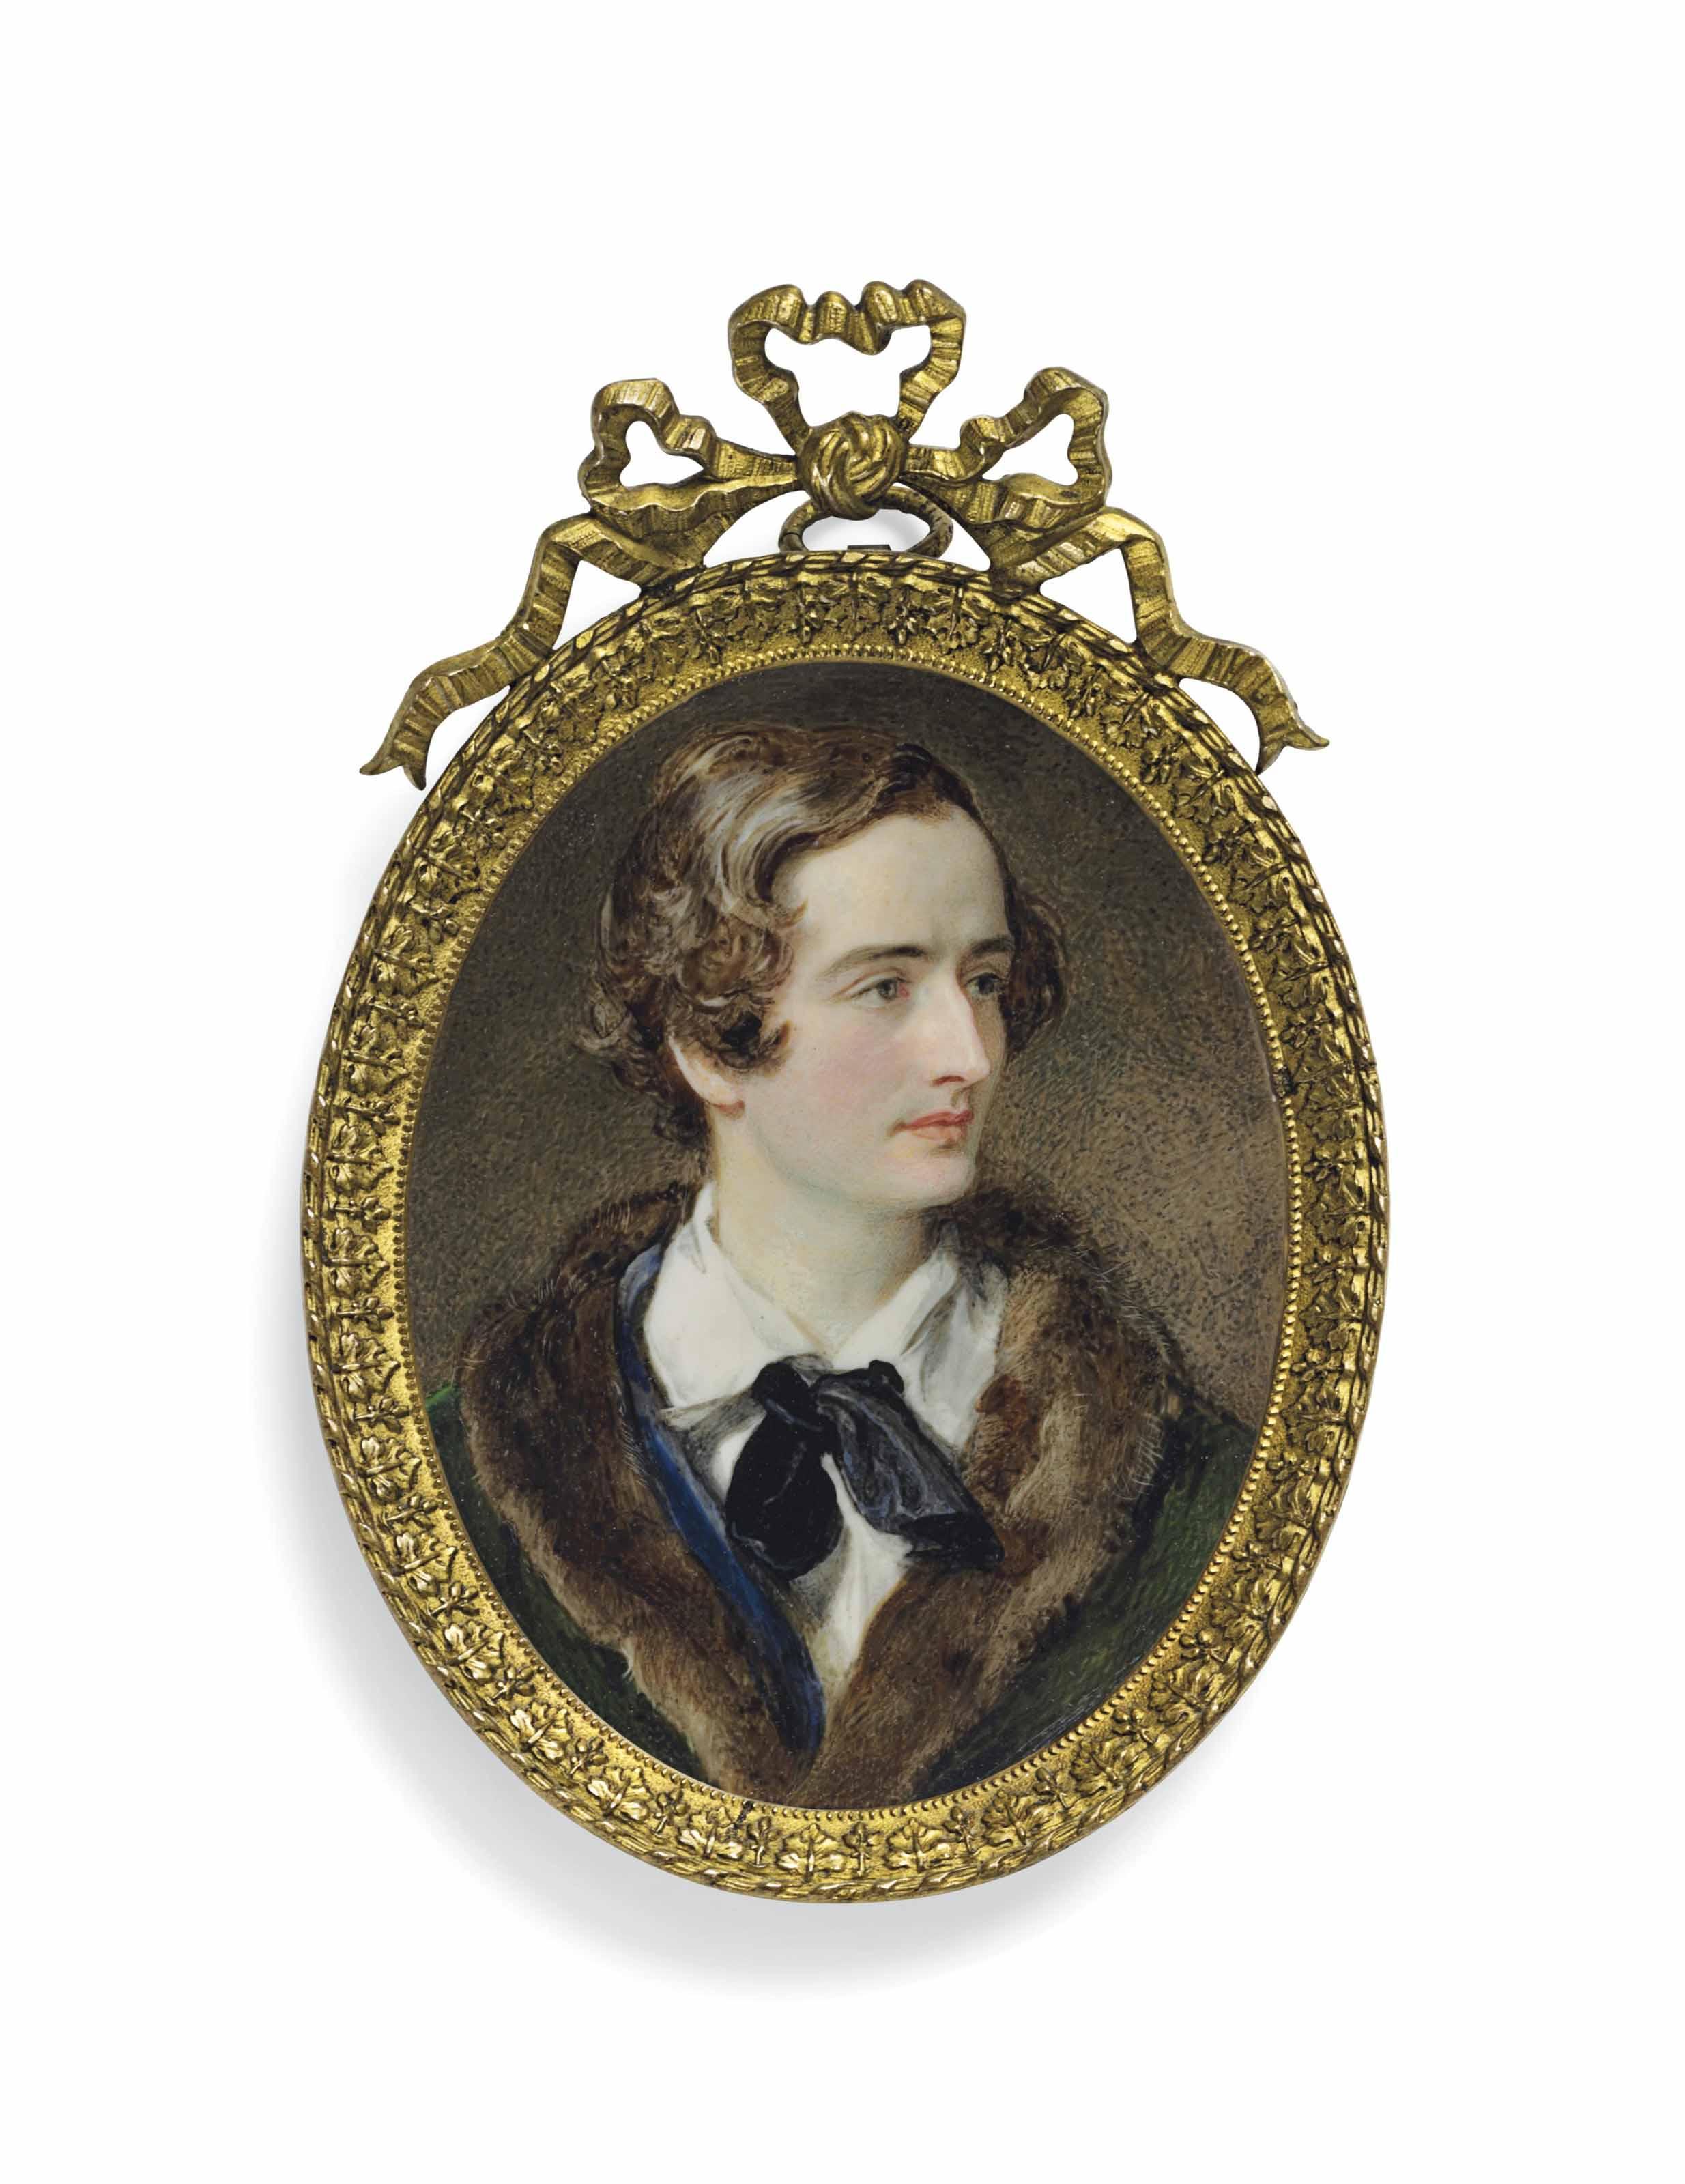 SIR WILLIAM CHARLES ROSS, R.A. (BRITISH, 1794-1860)